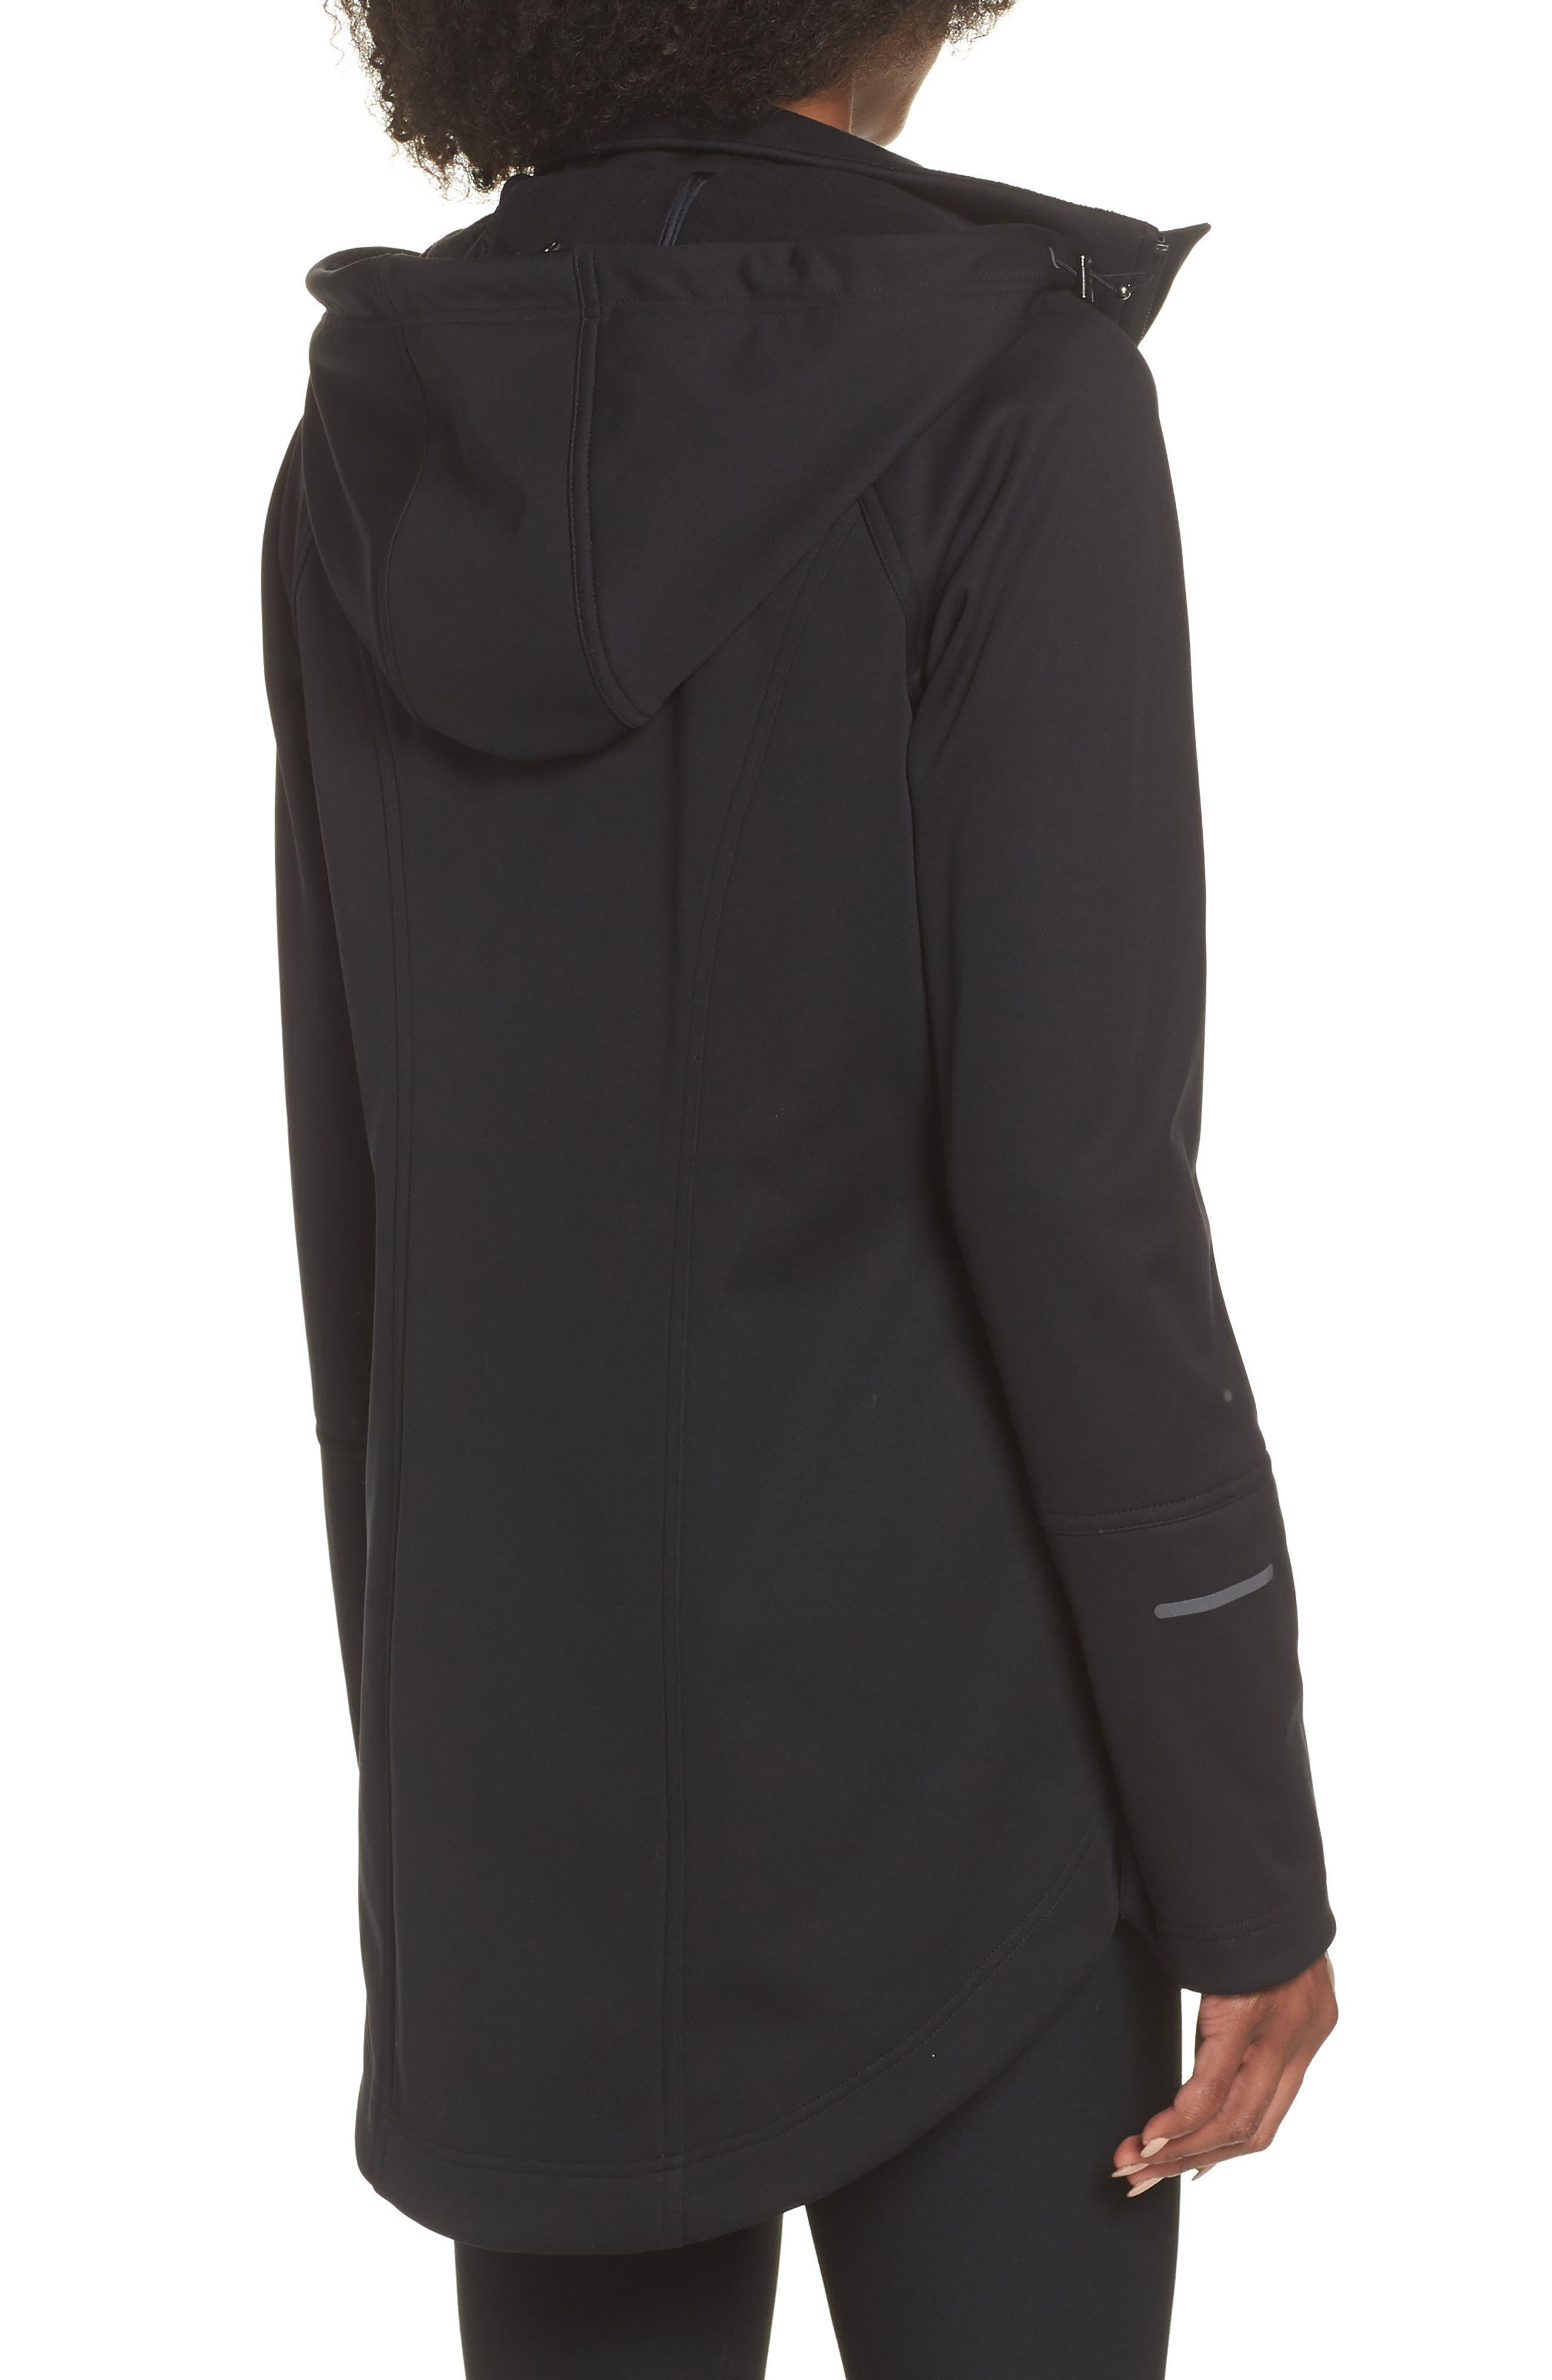 ZELLA, Aero Hooded Soft Shell Training Jacket, Alternate thumbnail 2, color, 001